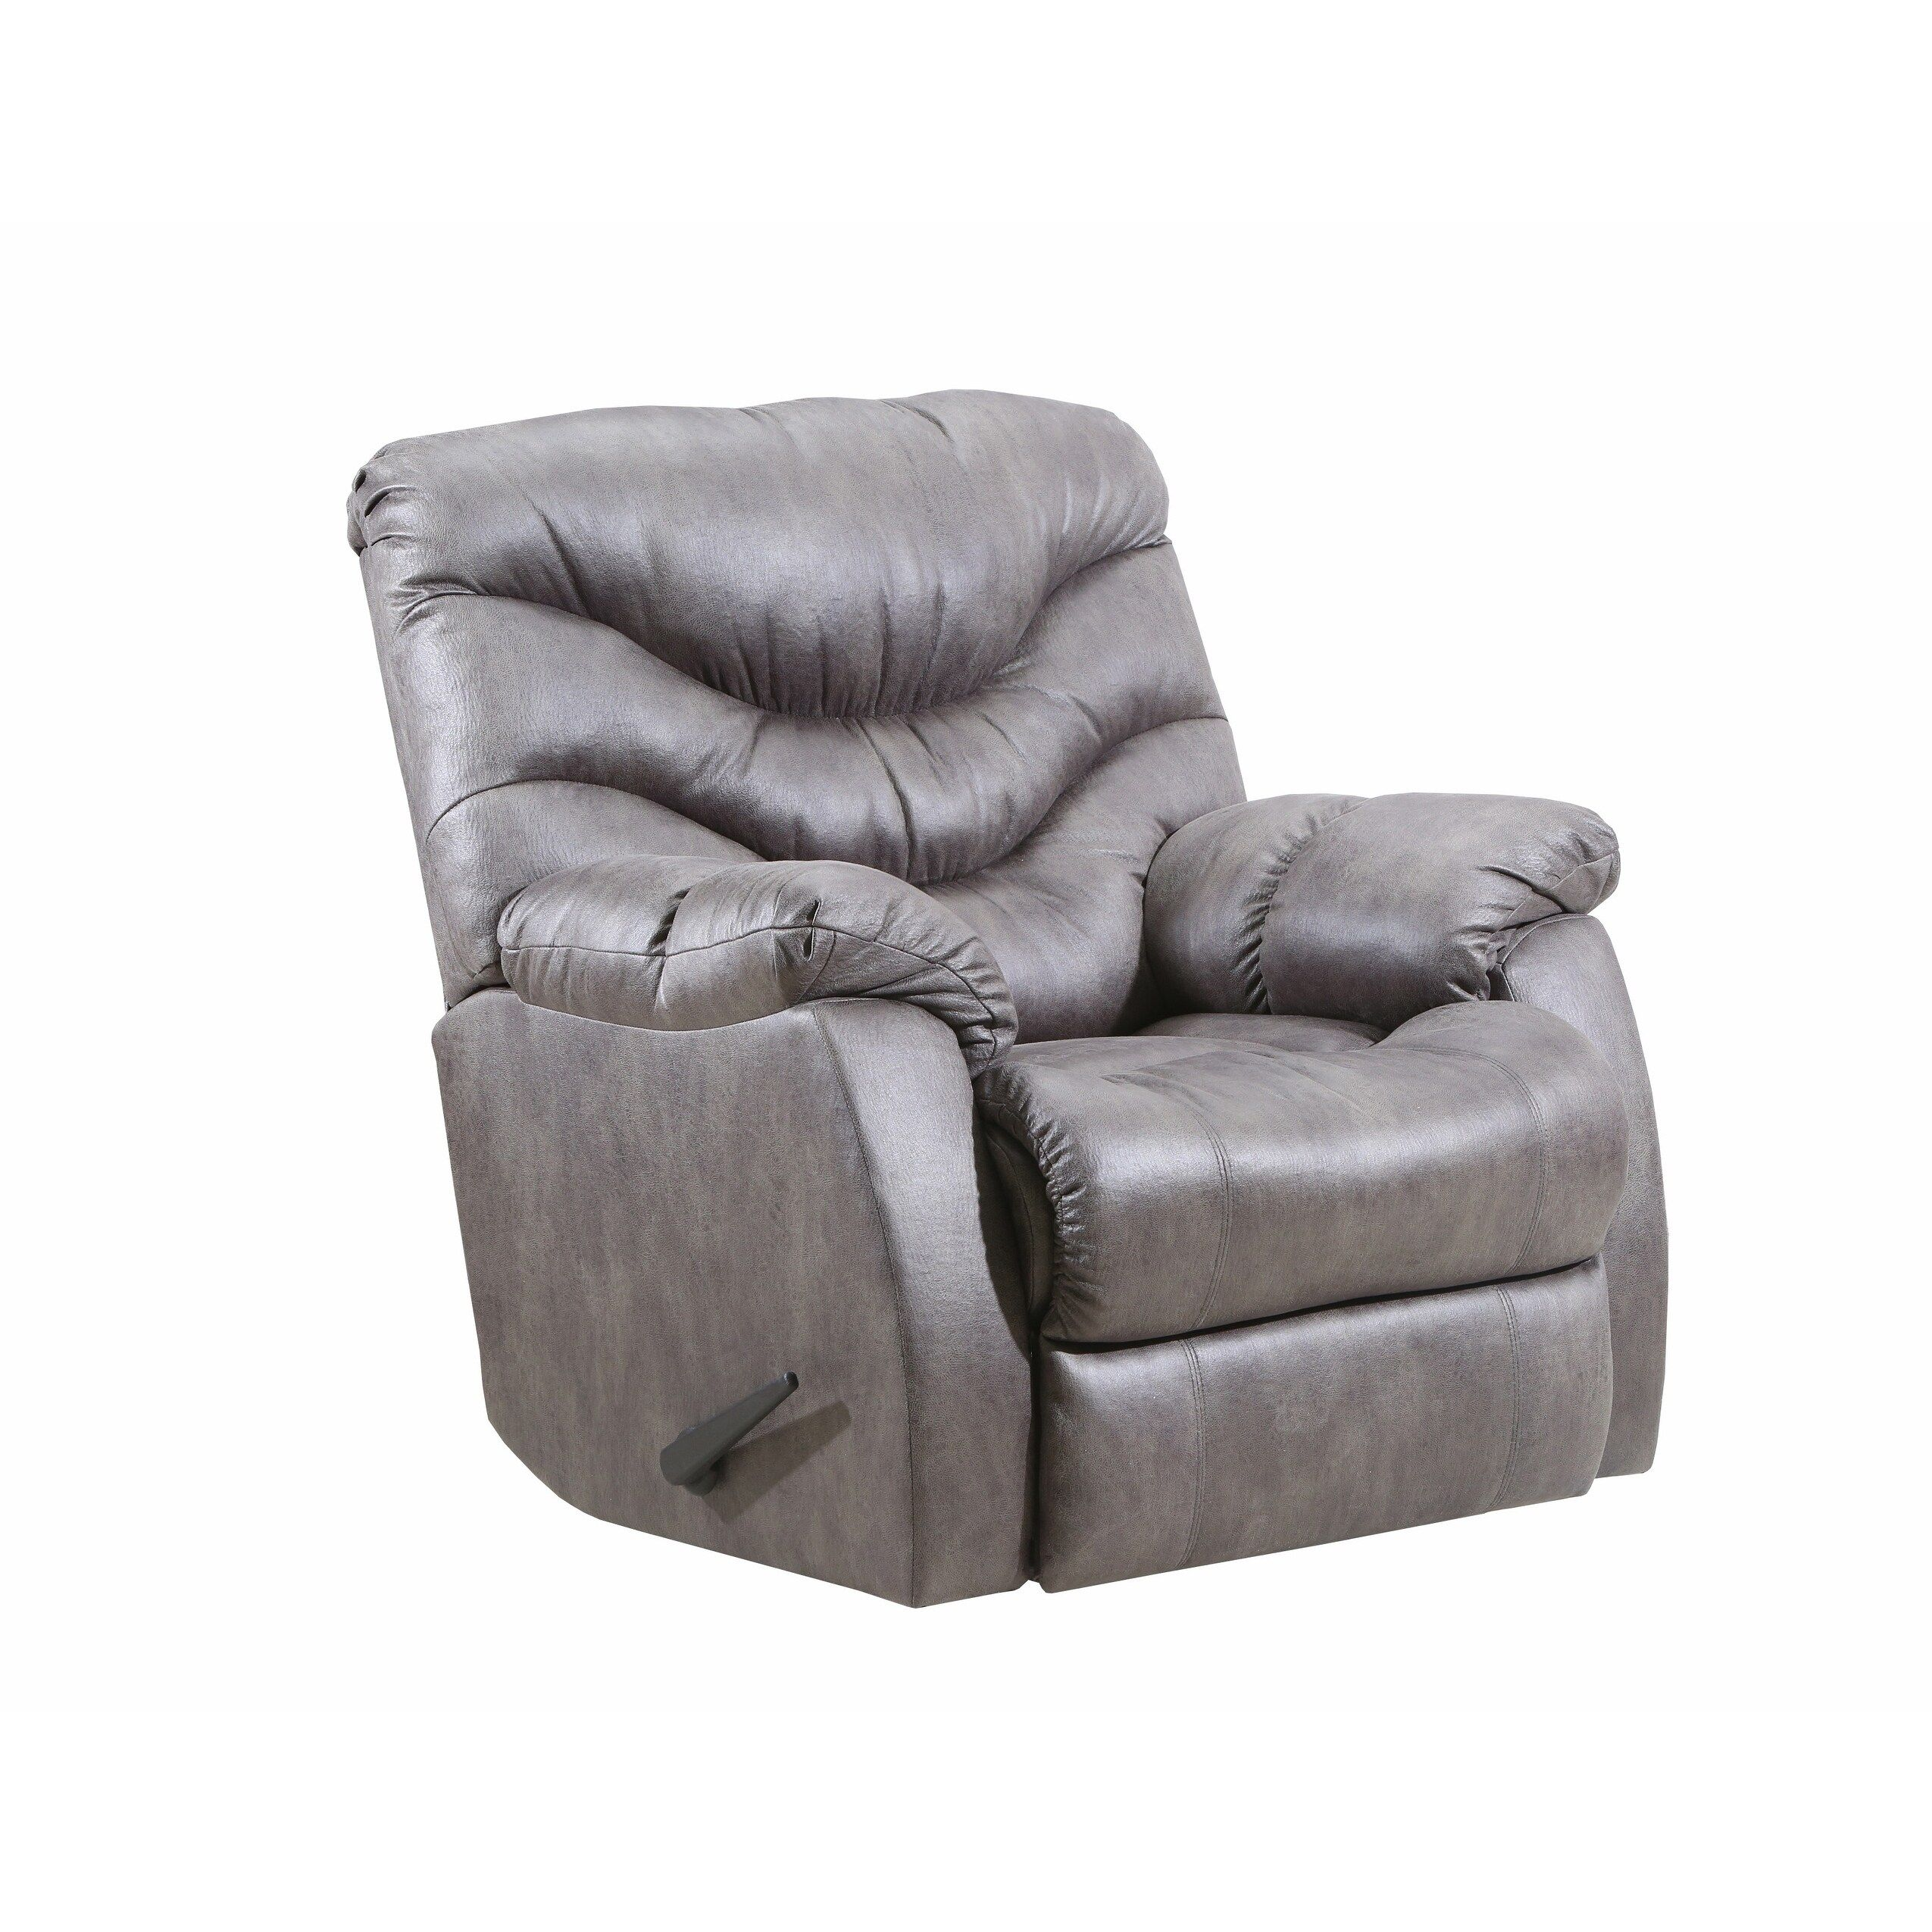 Online Shopping Bedding Furniture Electronics Jewelry Clothing More Lane Furniture Furniture Recliner